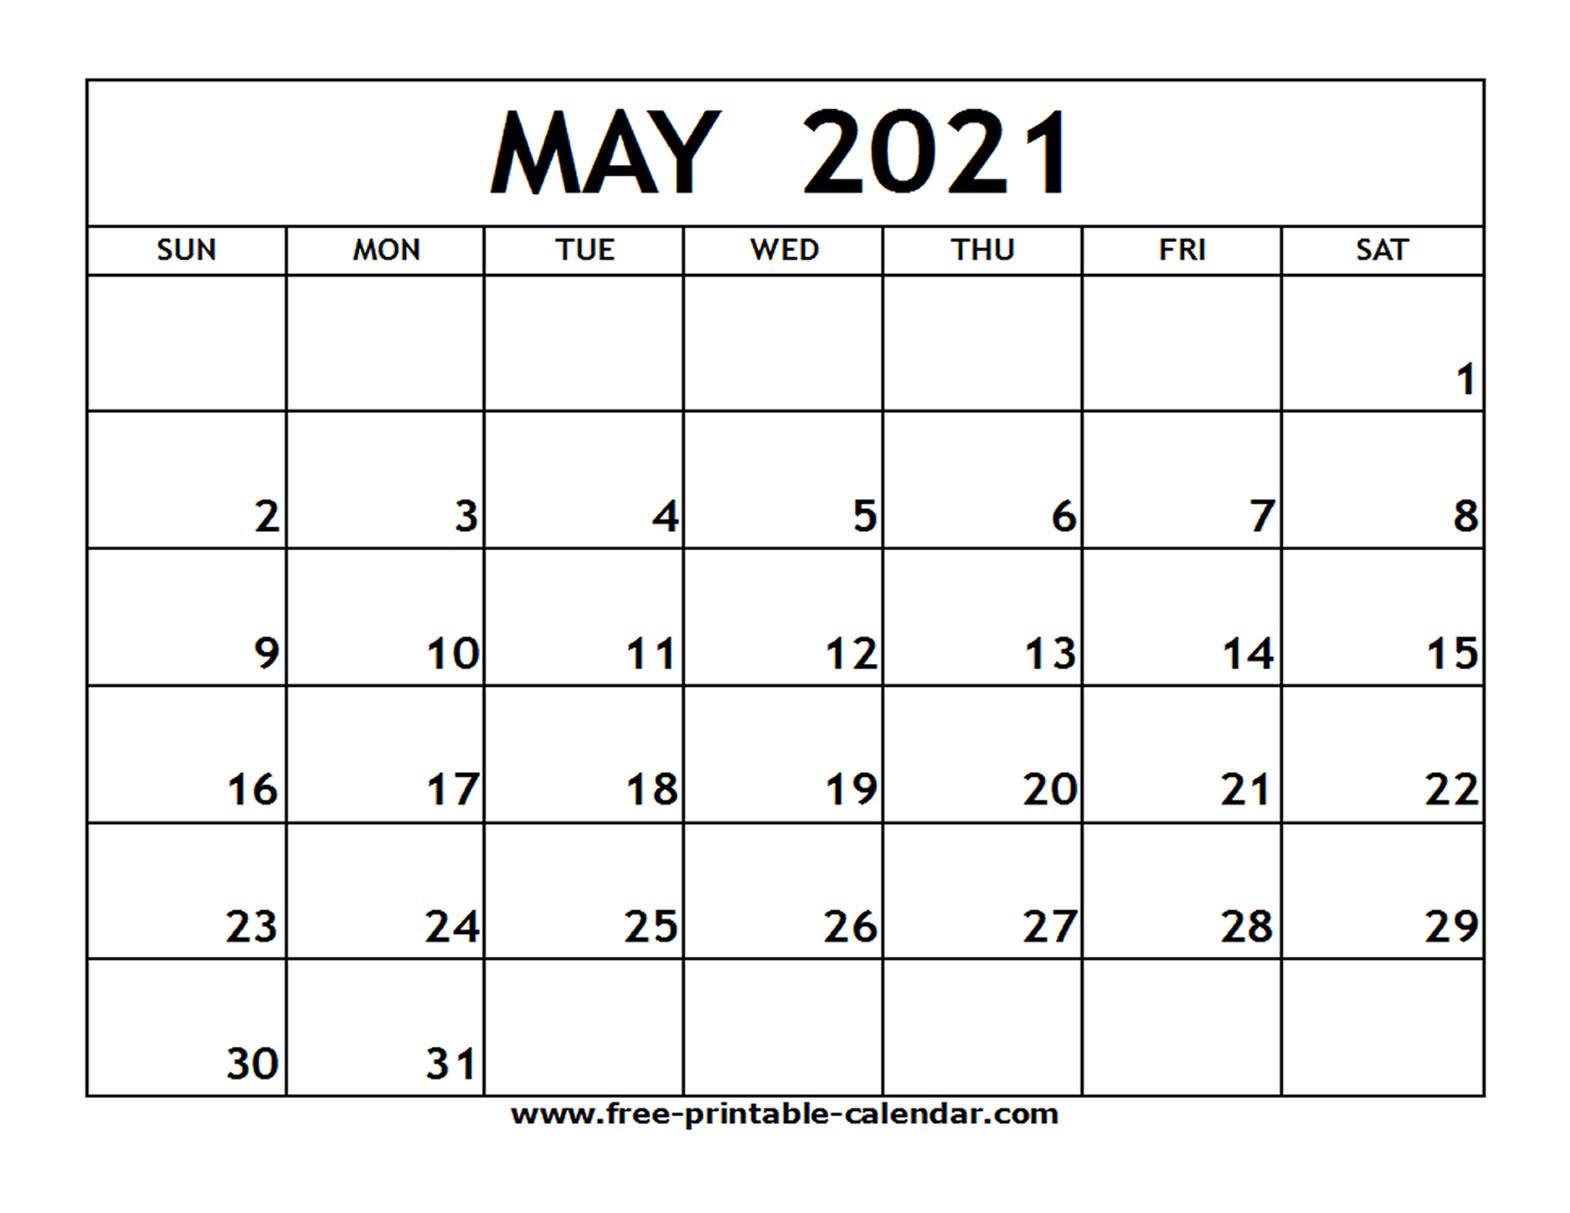 2021 Calendar Printable Pdf May | Free Printable Calendar intended for 2021 Word Calendar Wincalendar